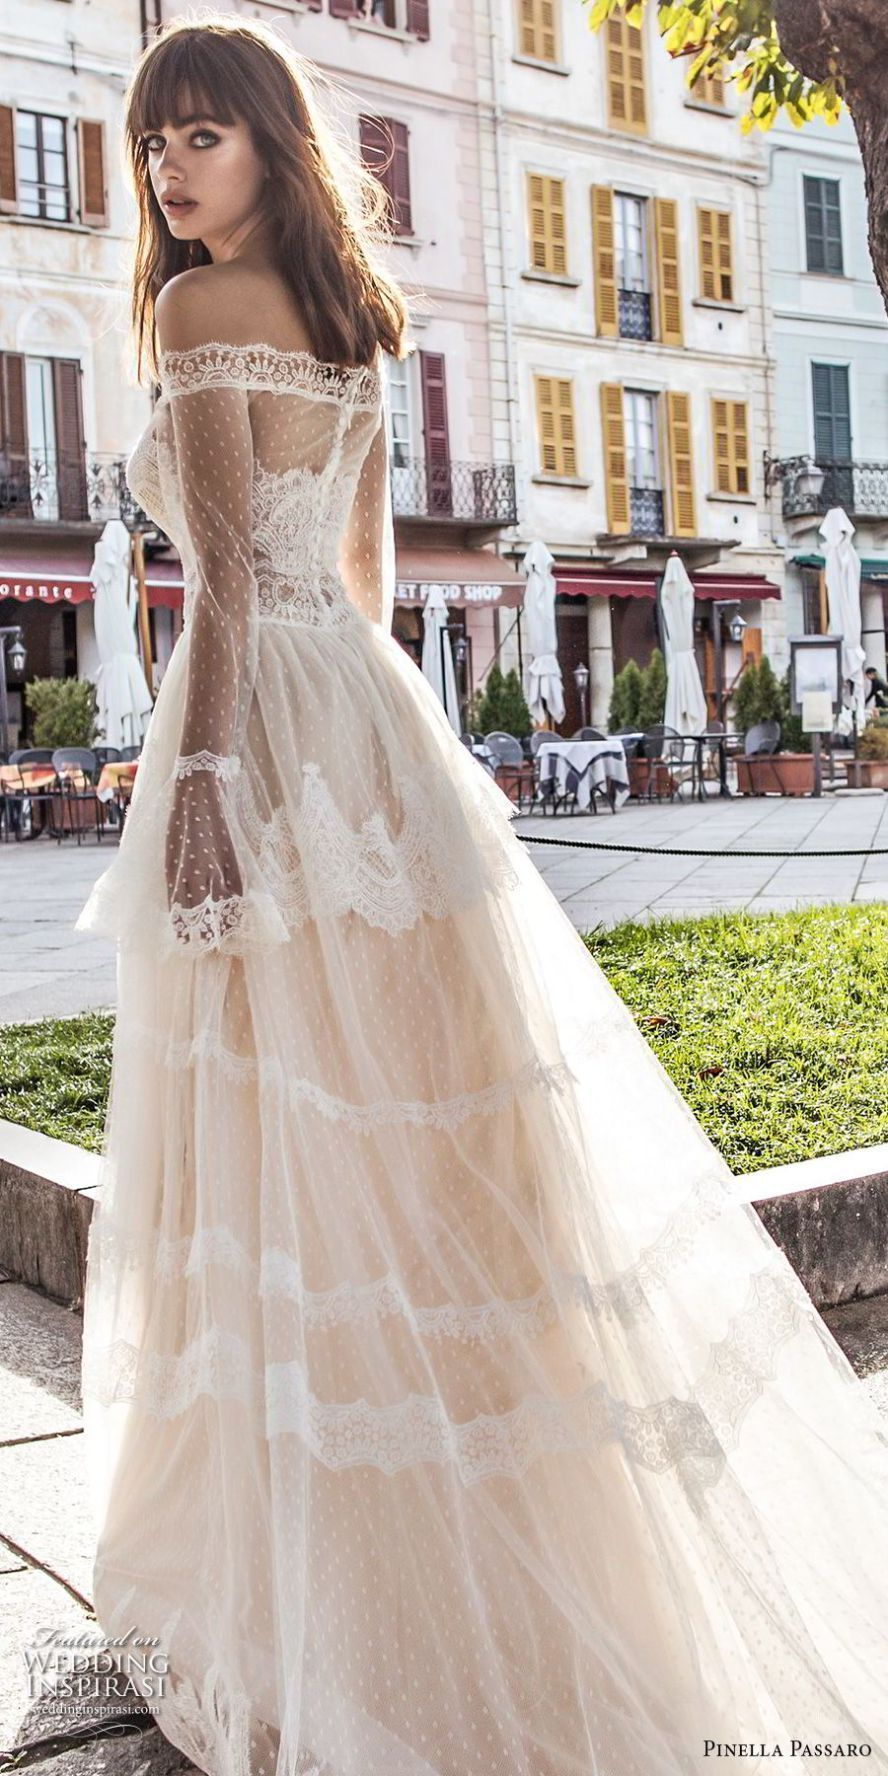 Pinella passaro wedding dresses weddinggowns weddingdress